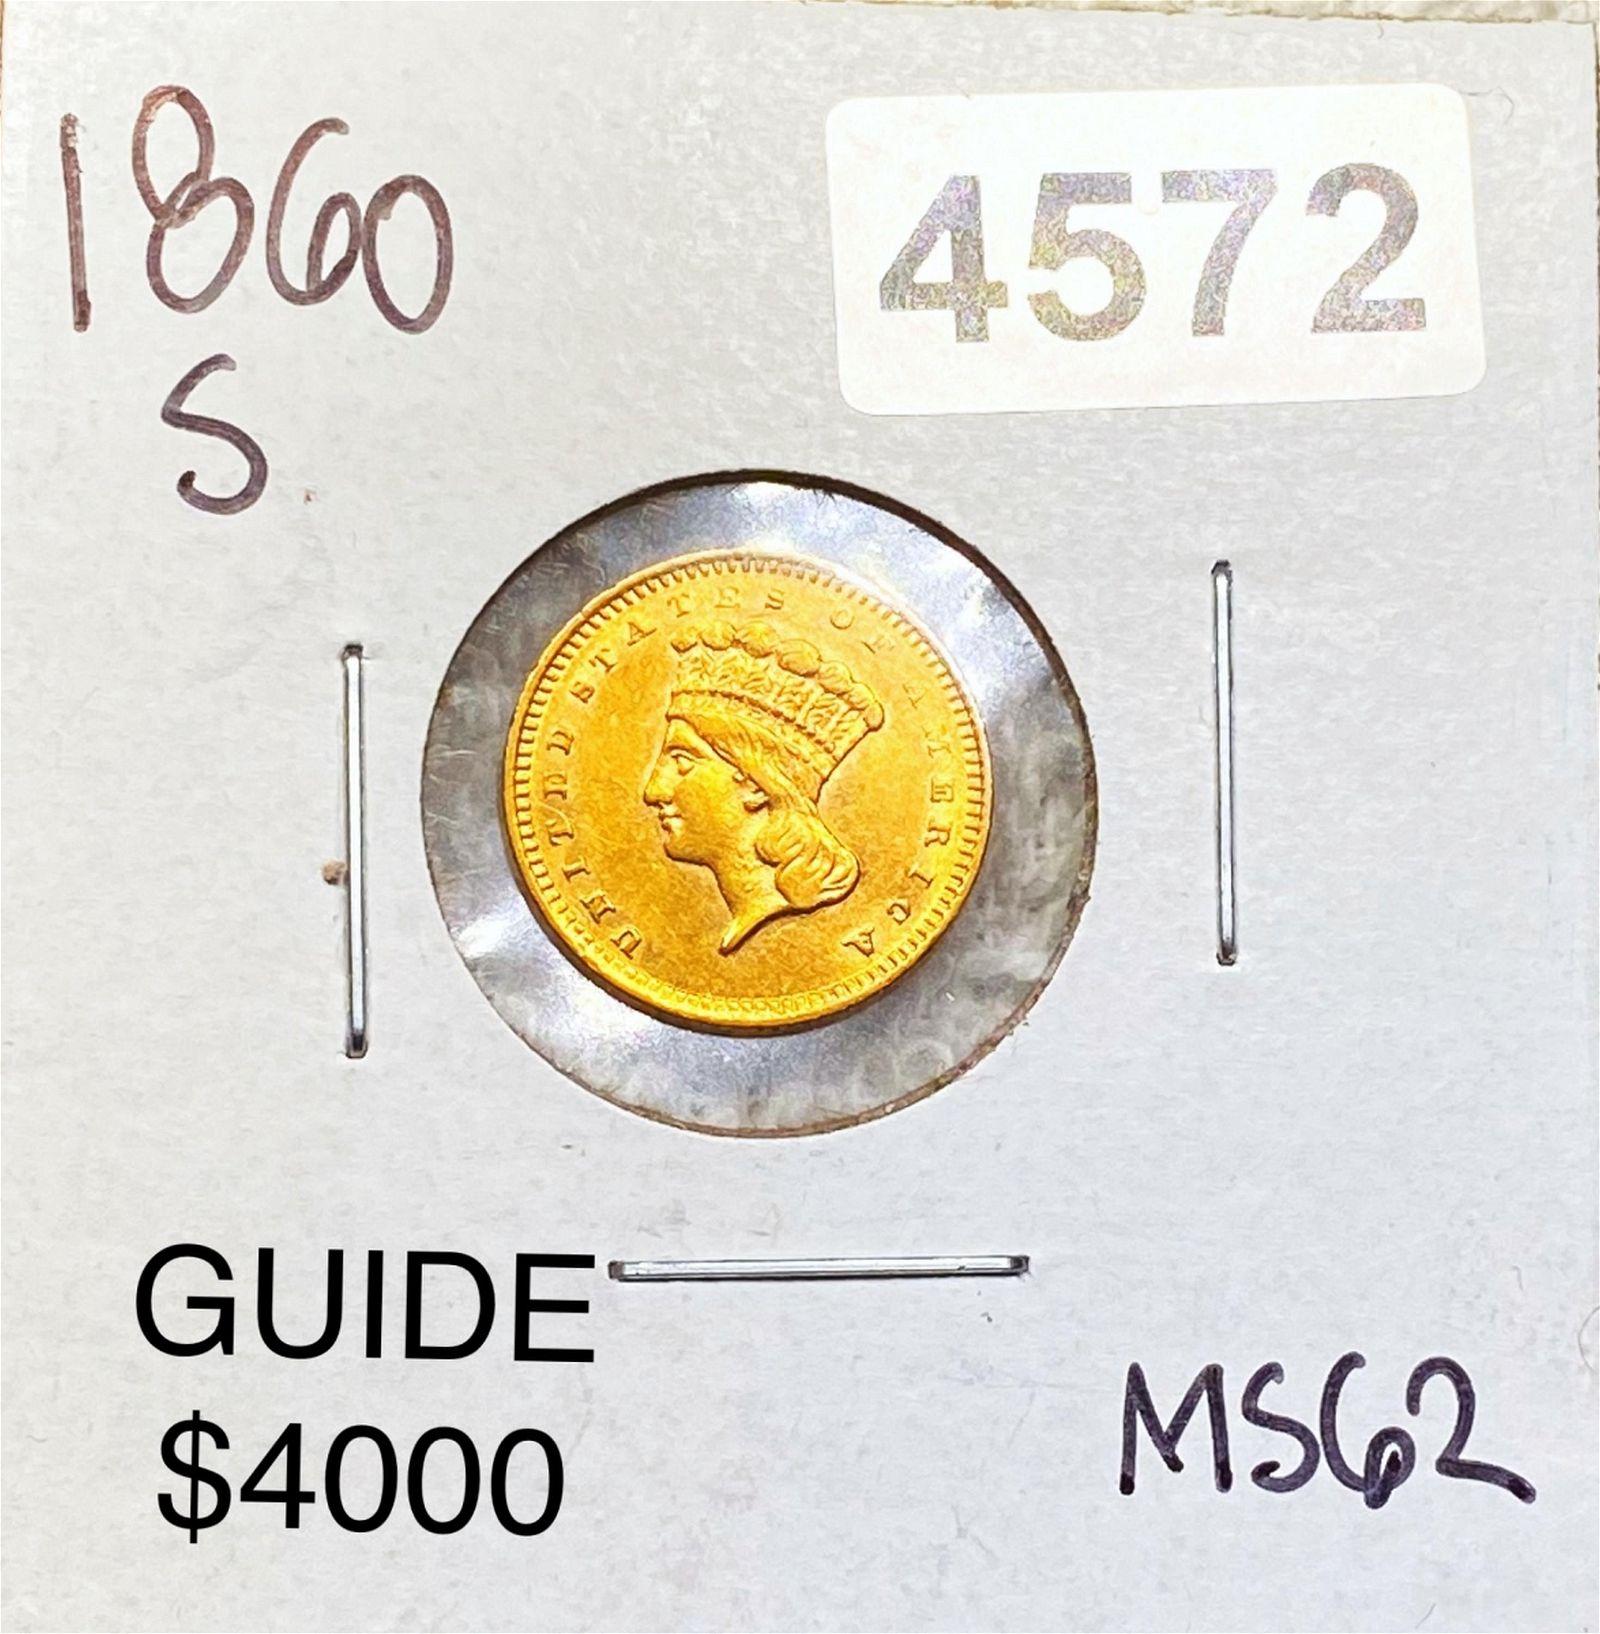 1860-S Rare Gold Dollar UNCIRCULATED